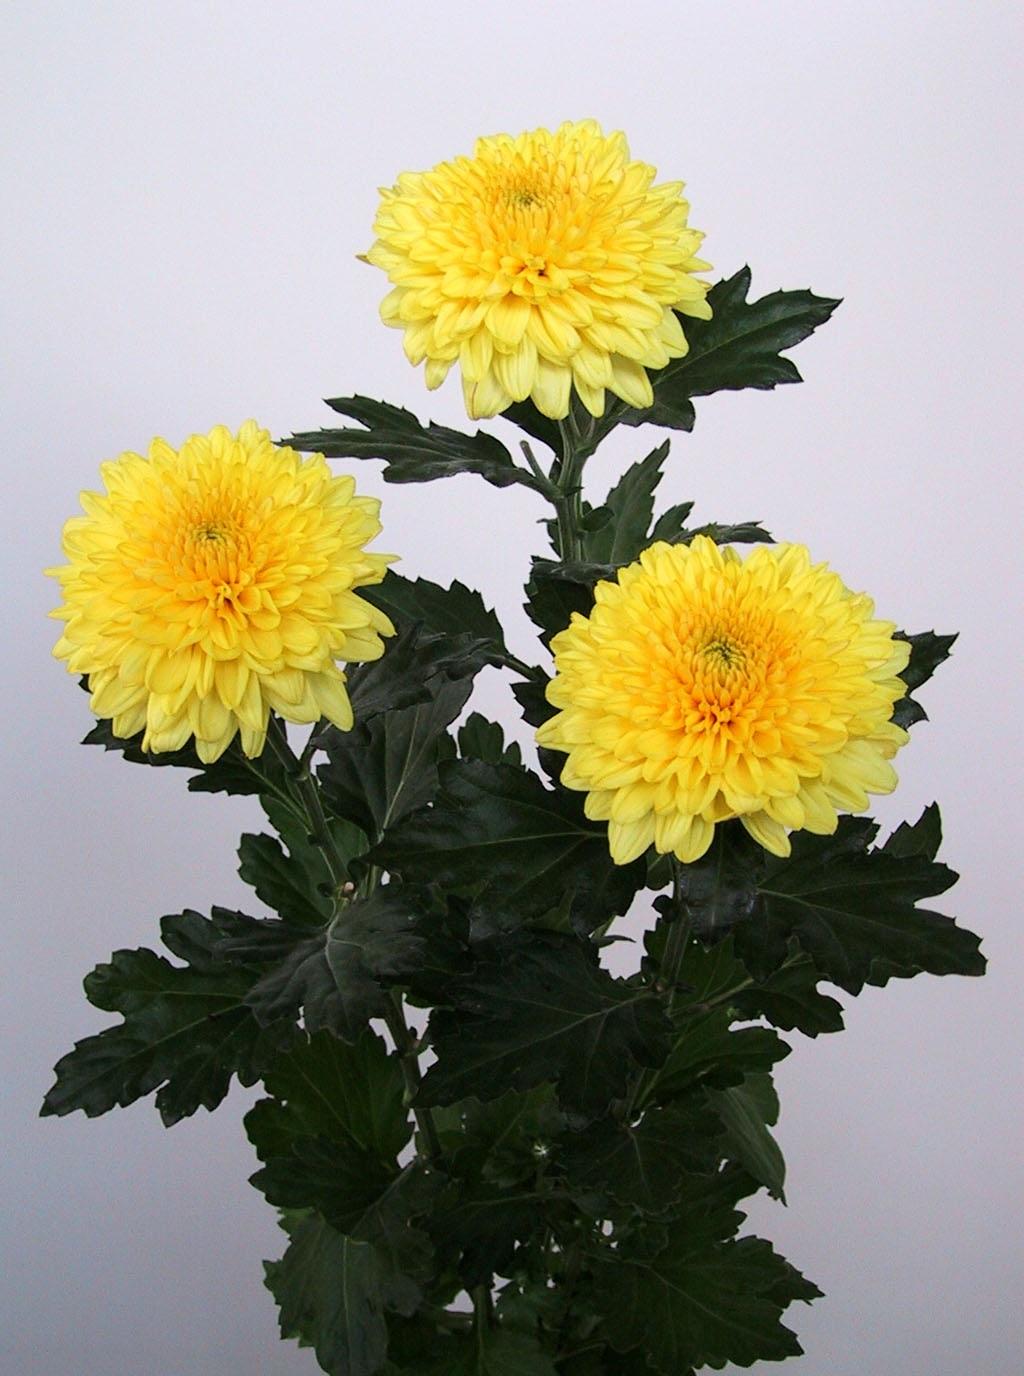 Яркие желтые хризантемы